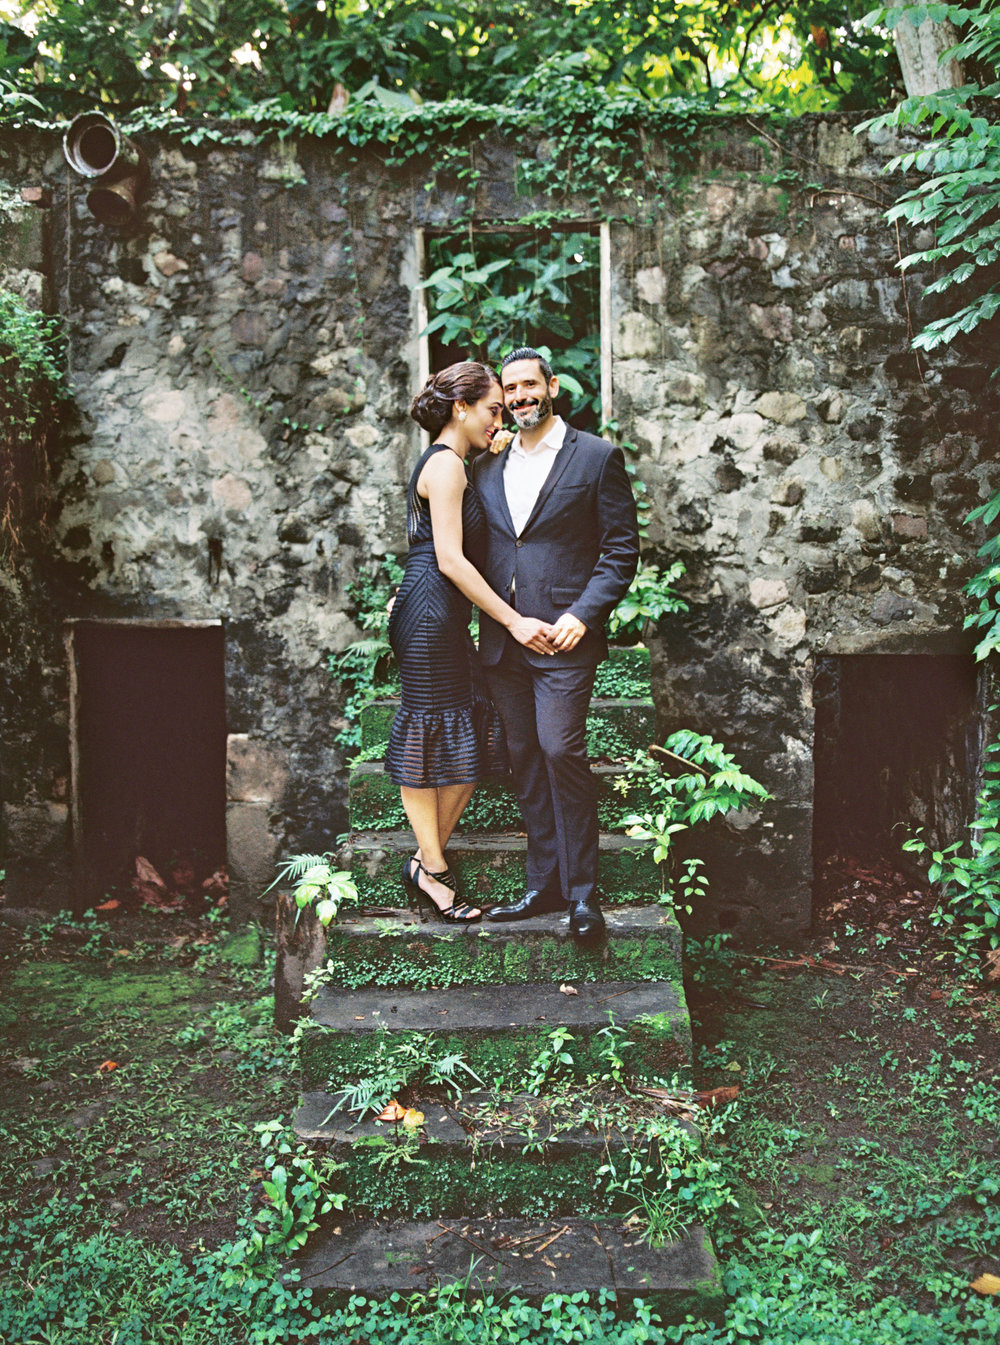 010Delmary's & Daniel : Engagement Photos : St. Lucia : Carribean : Elopement : Outlive Creative : 2016.jpg